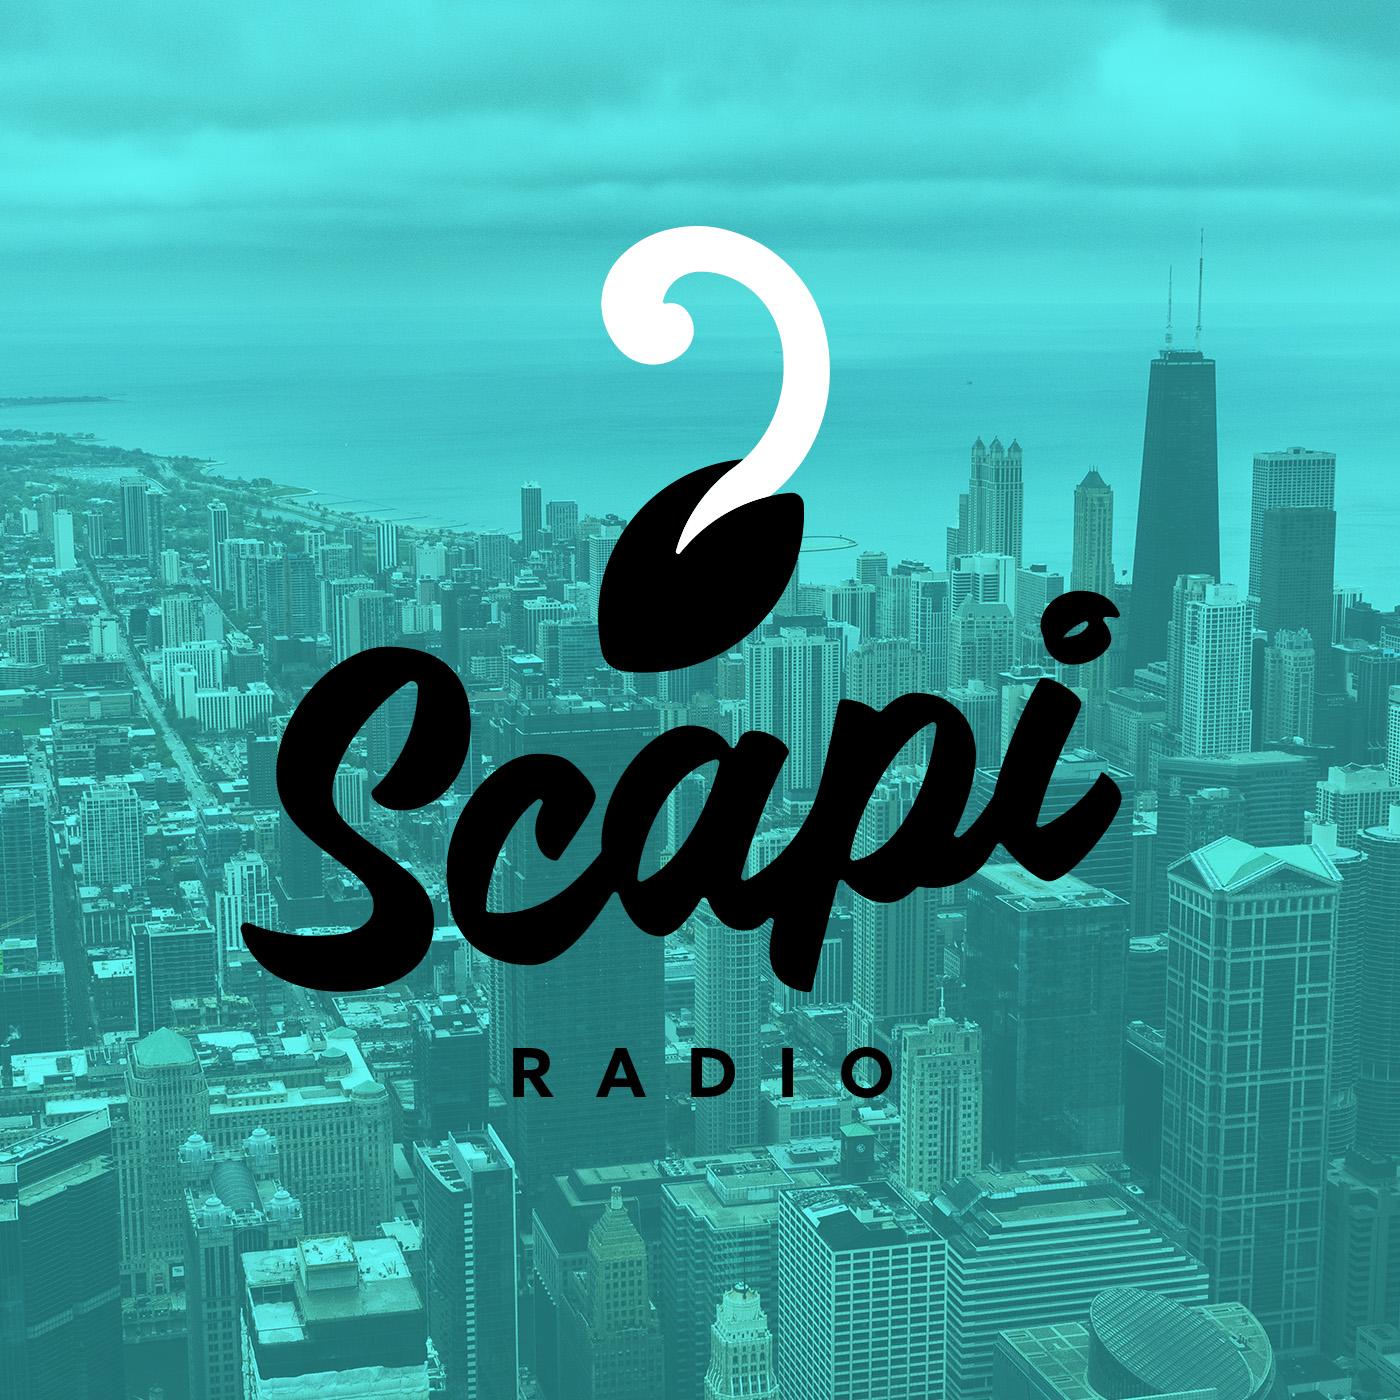 Interview w/ Scapi Radio - Listen Here